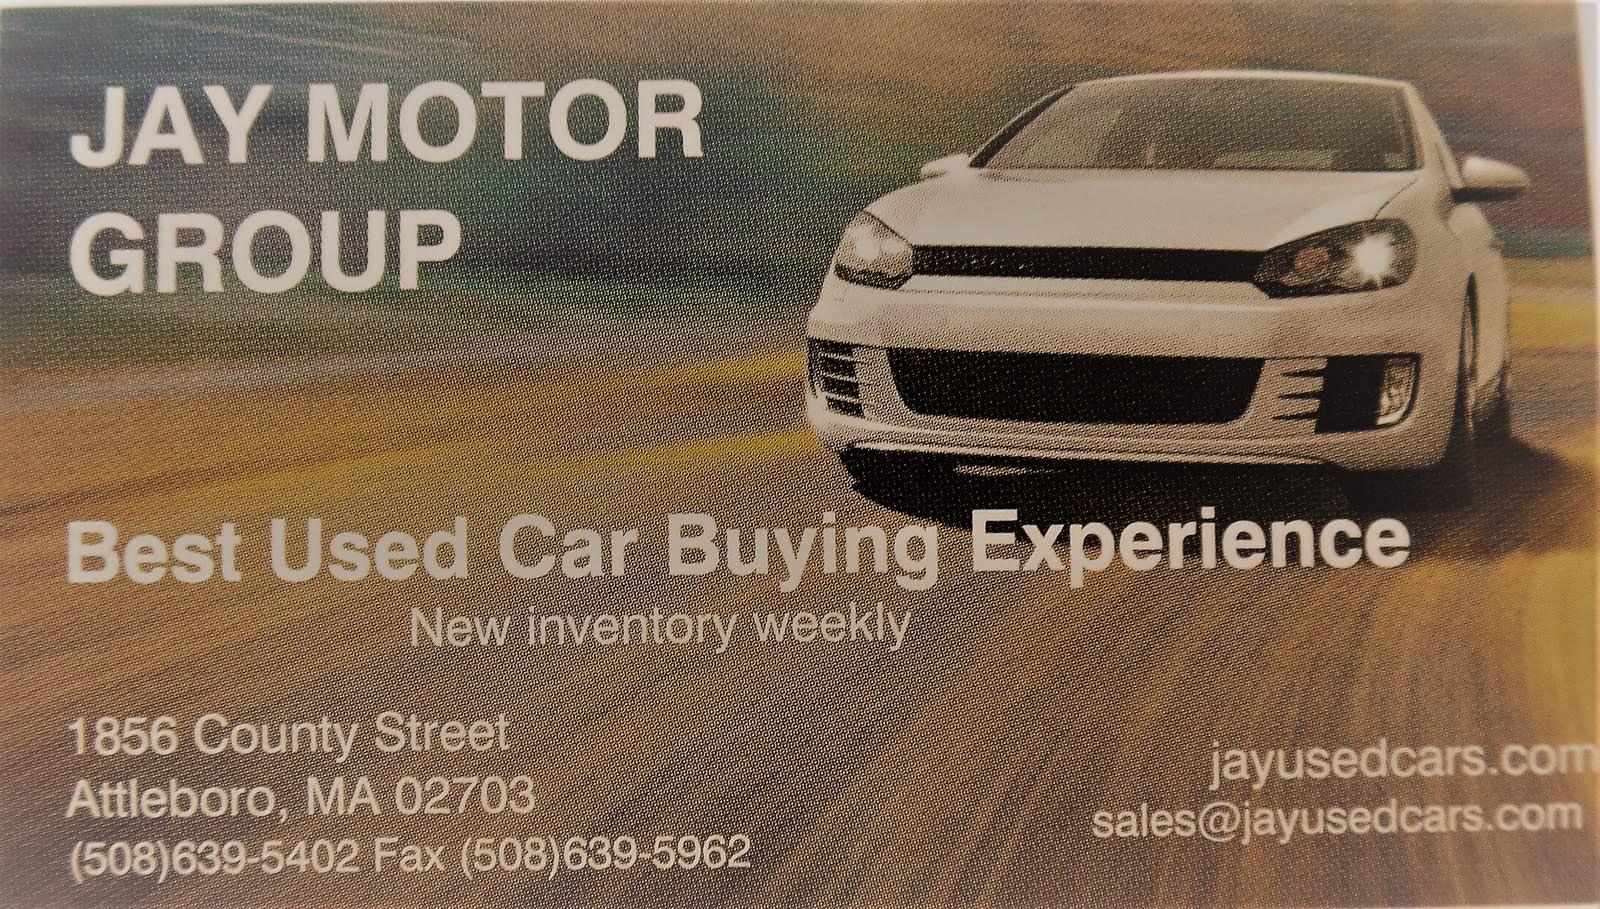 Fiat Of Providence >> Jay Motor Group - Attleboro, MA: Read Consumer reviews ...